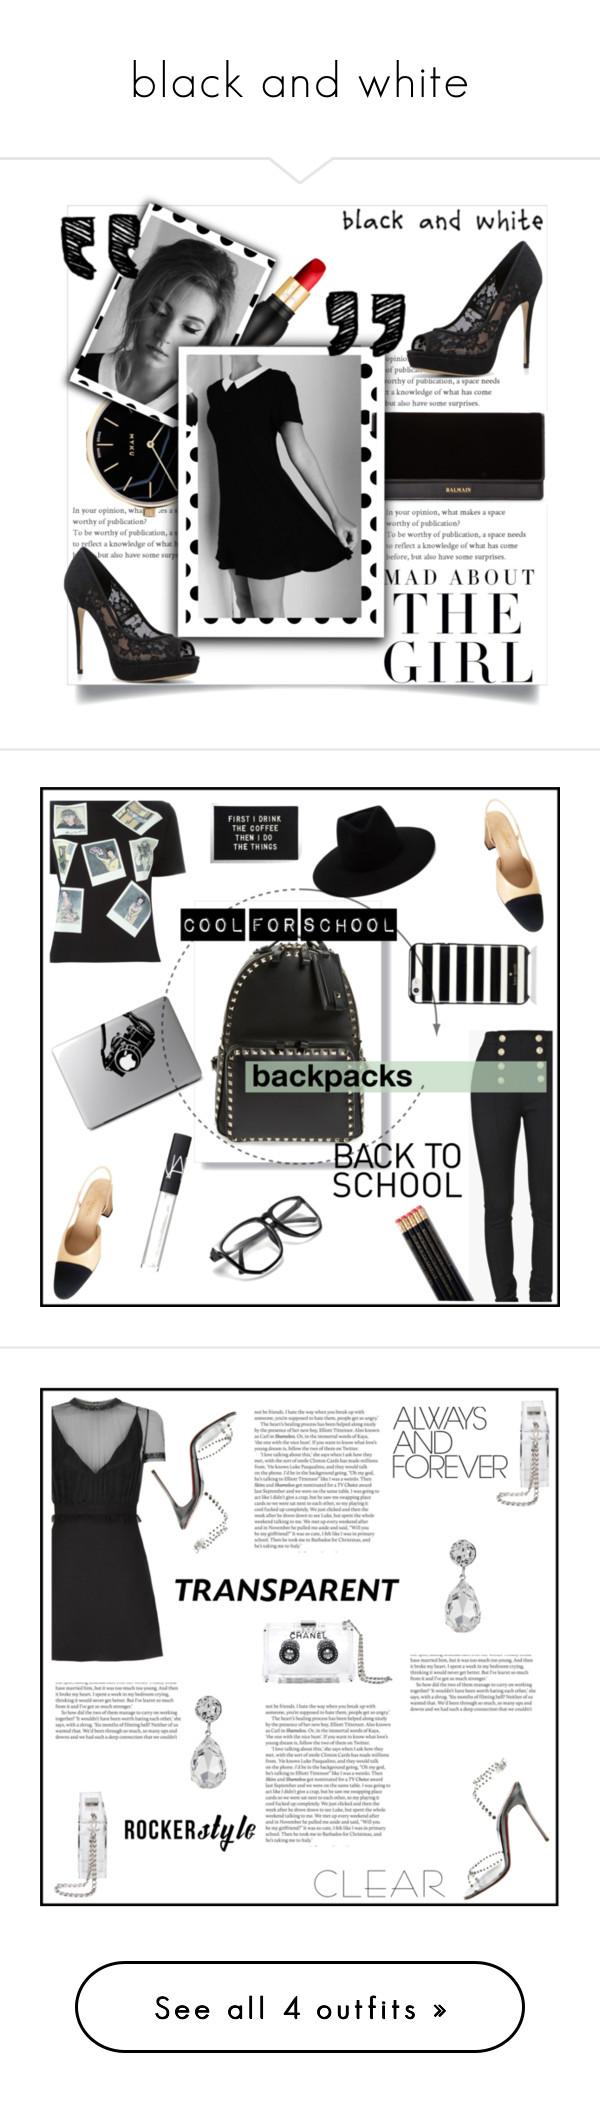 """black and white"" by fashion12girl on Polyvore featuring moda, Myku, Christian Louboutin, Balmain, Kershaw, ALDO, Olympia Le-Tan, Chanel, Valentino y rag & bone"